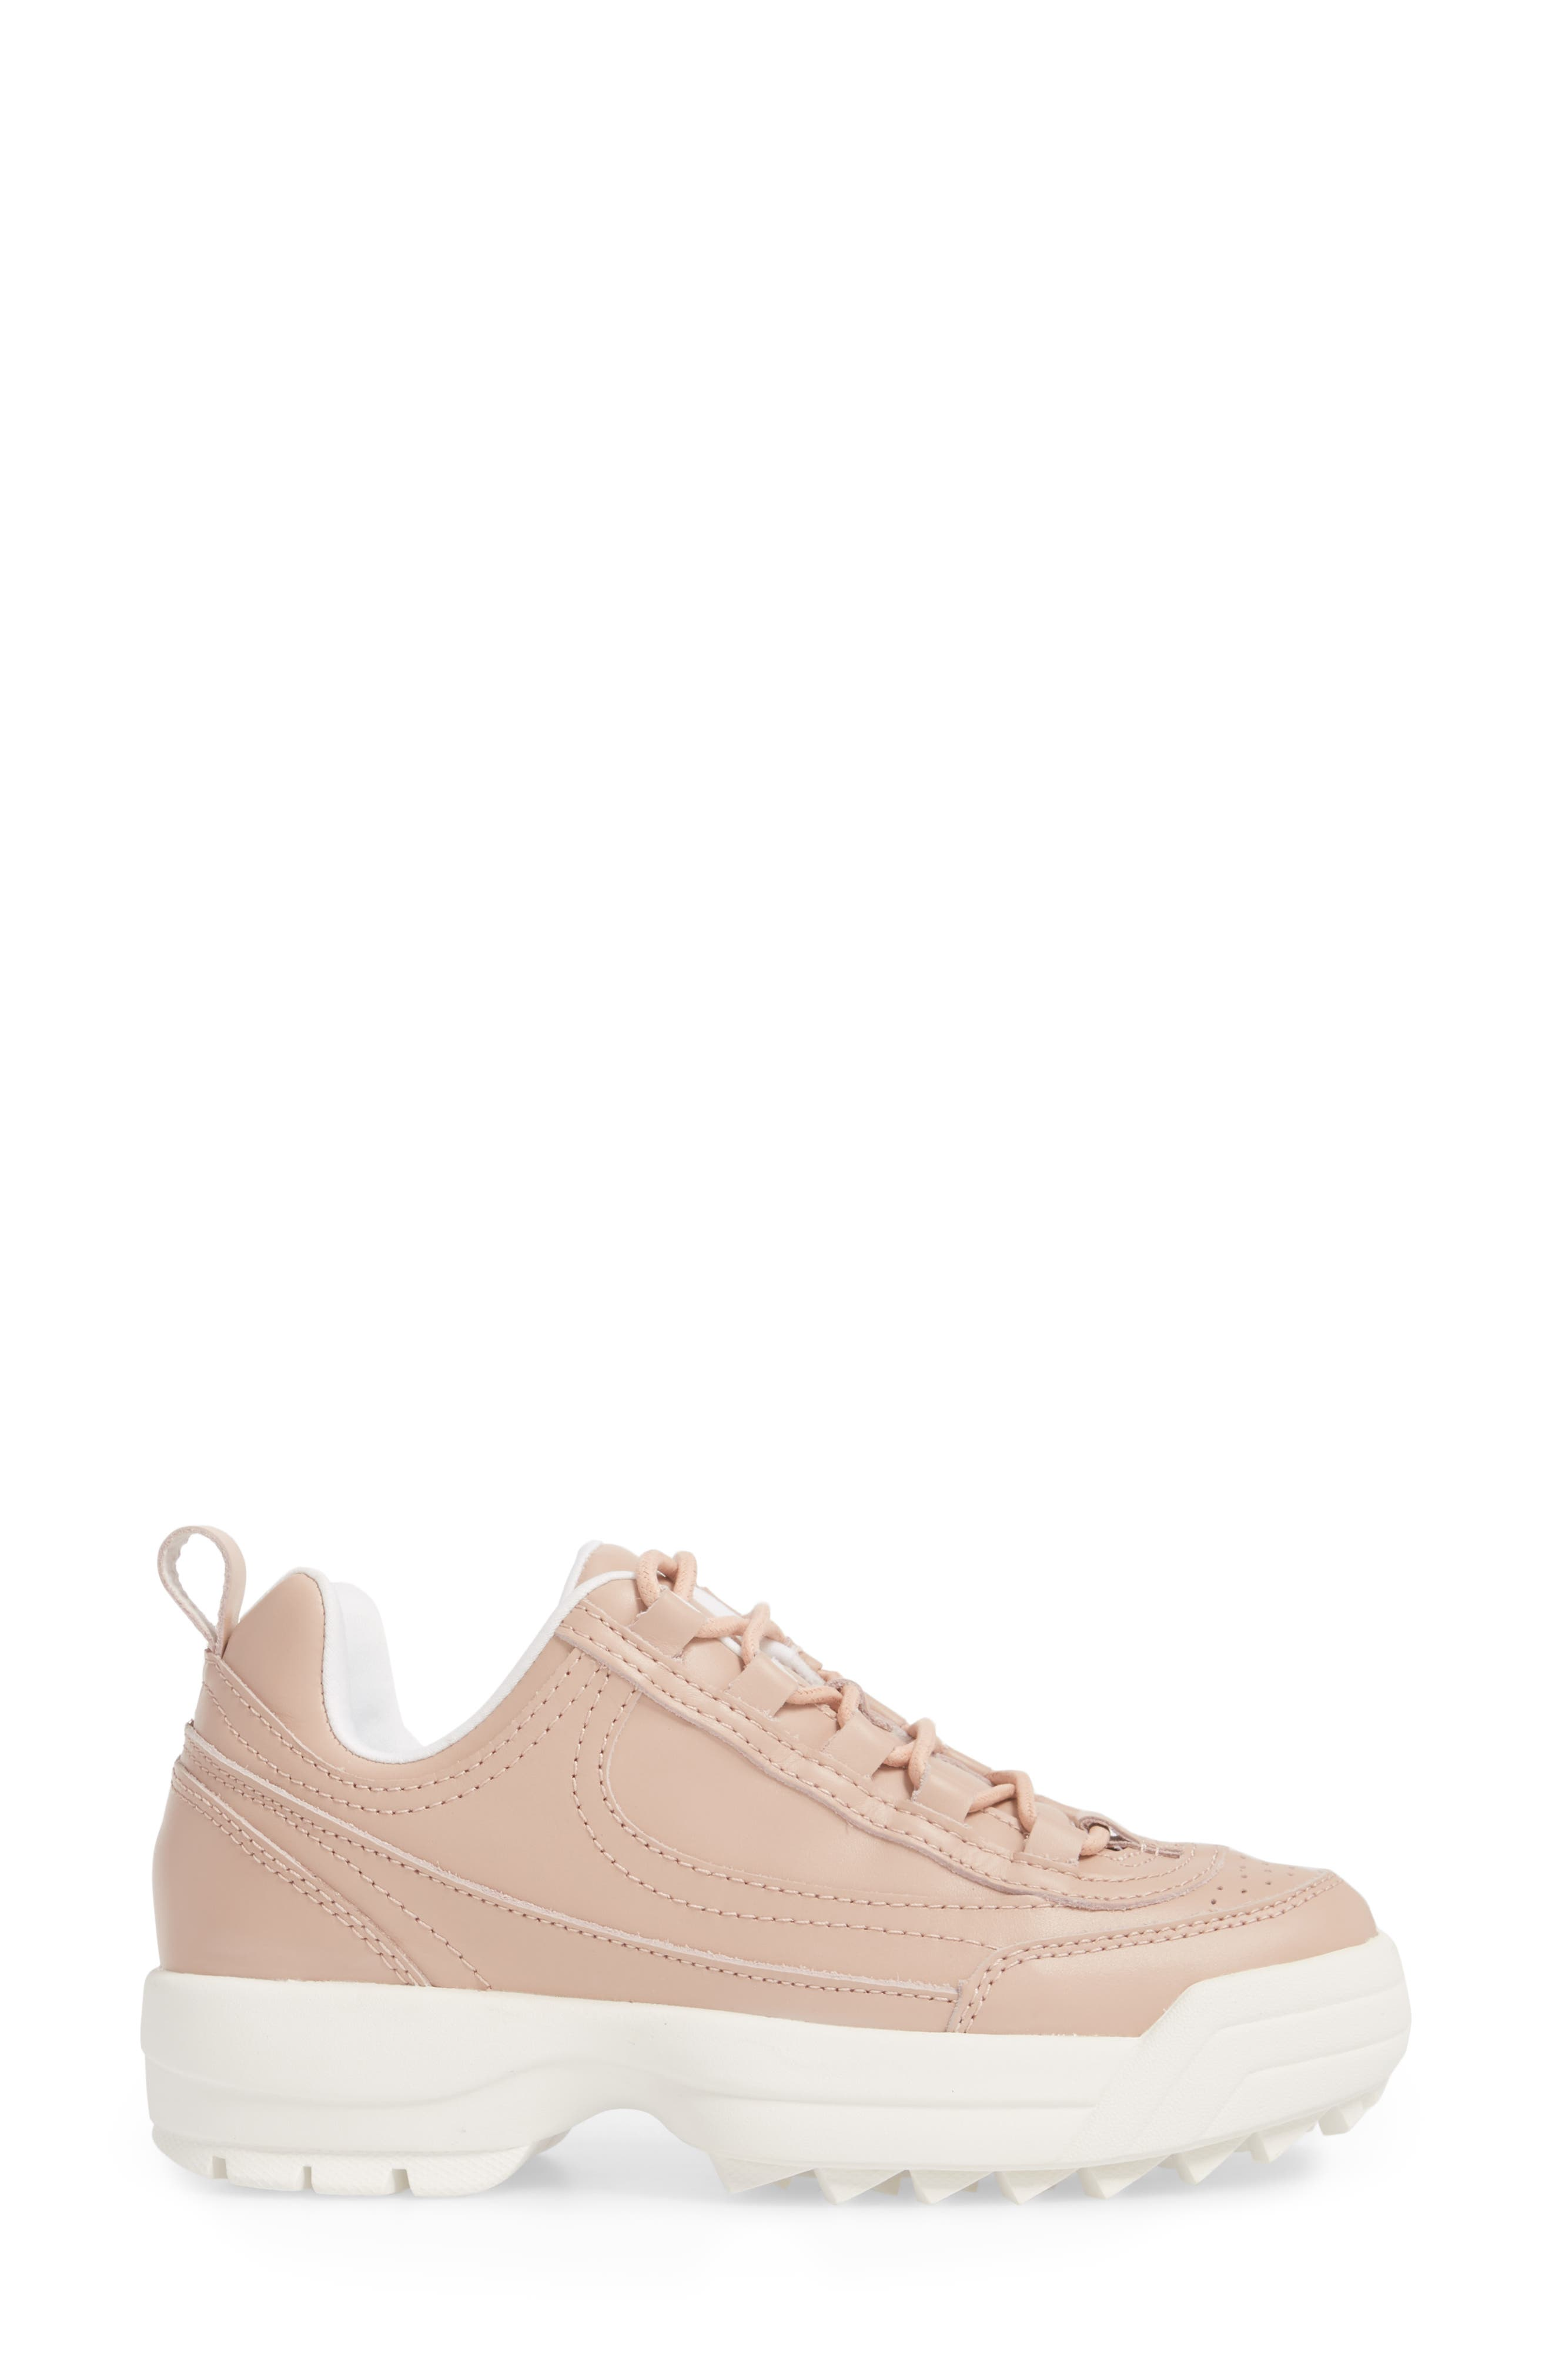 Sidekick Platform Sneaker,                             Alternate thumbnail 3, color,                             NUDE LEATHER